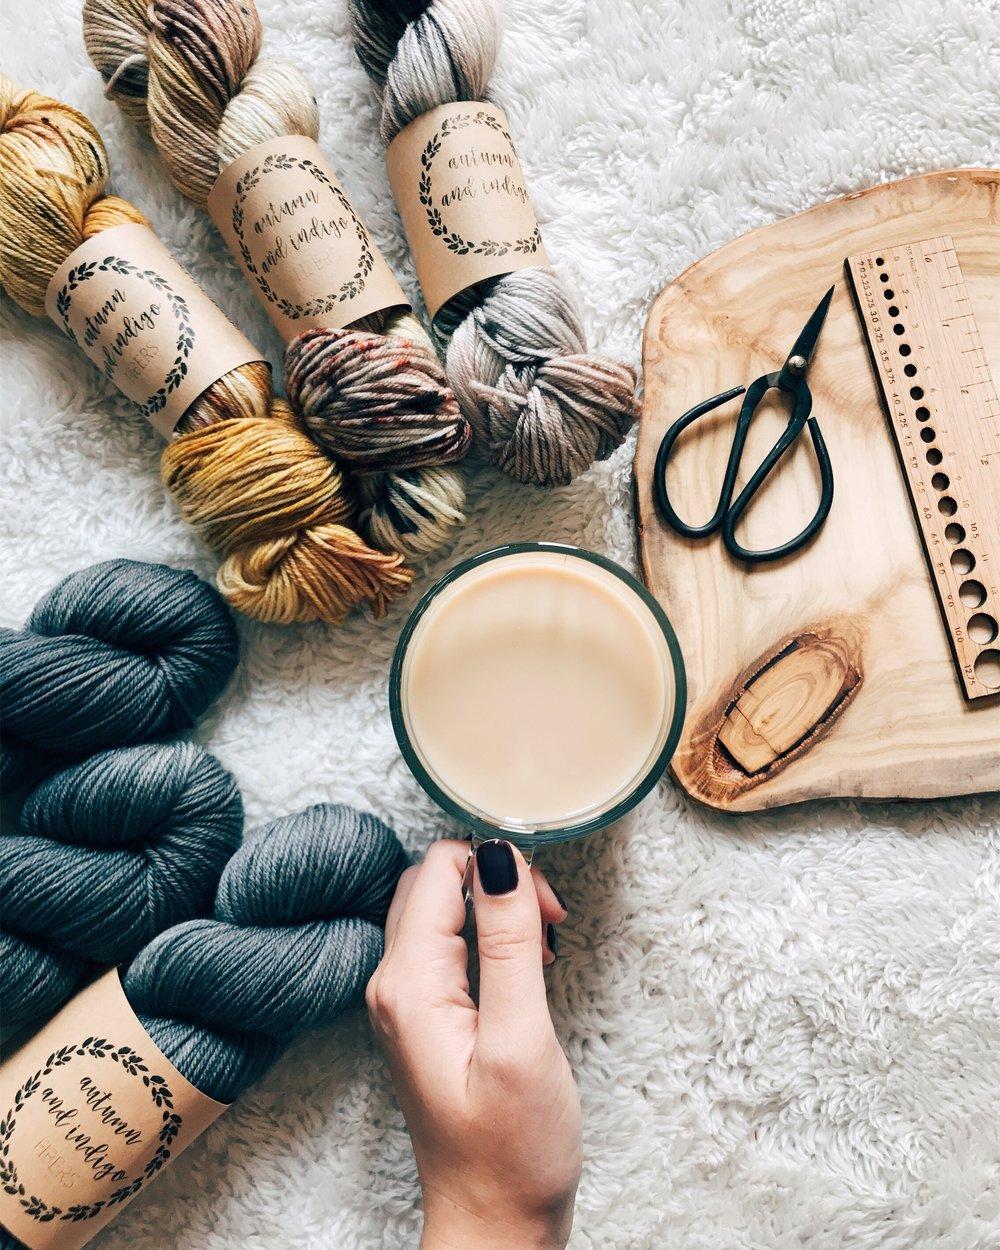 Yarn : Autumn and Indigo Sport in Gold Rush, Sepia, Mushroom, and Midnight Grey